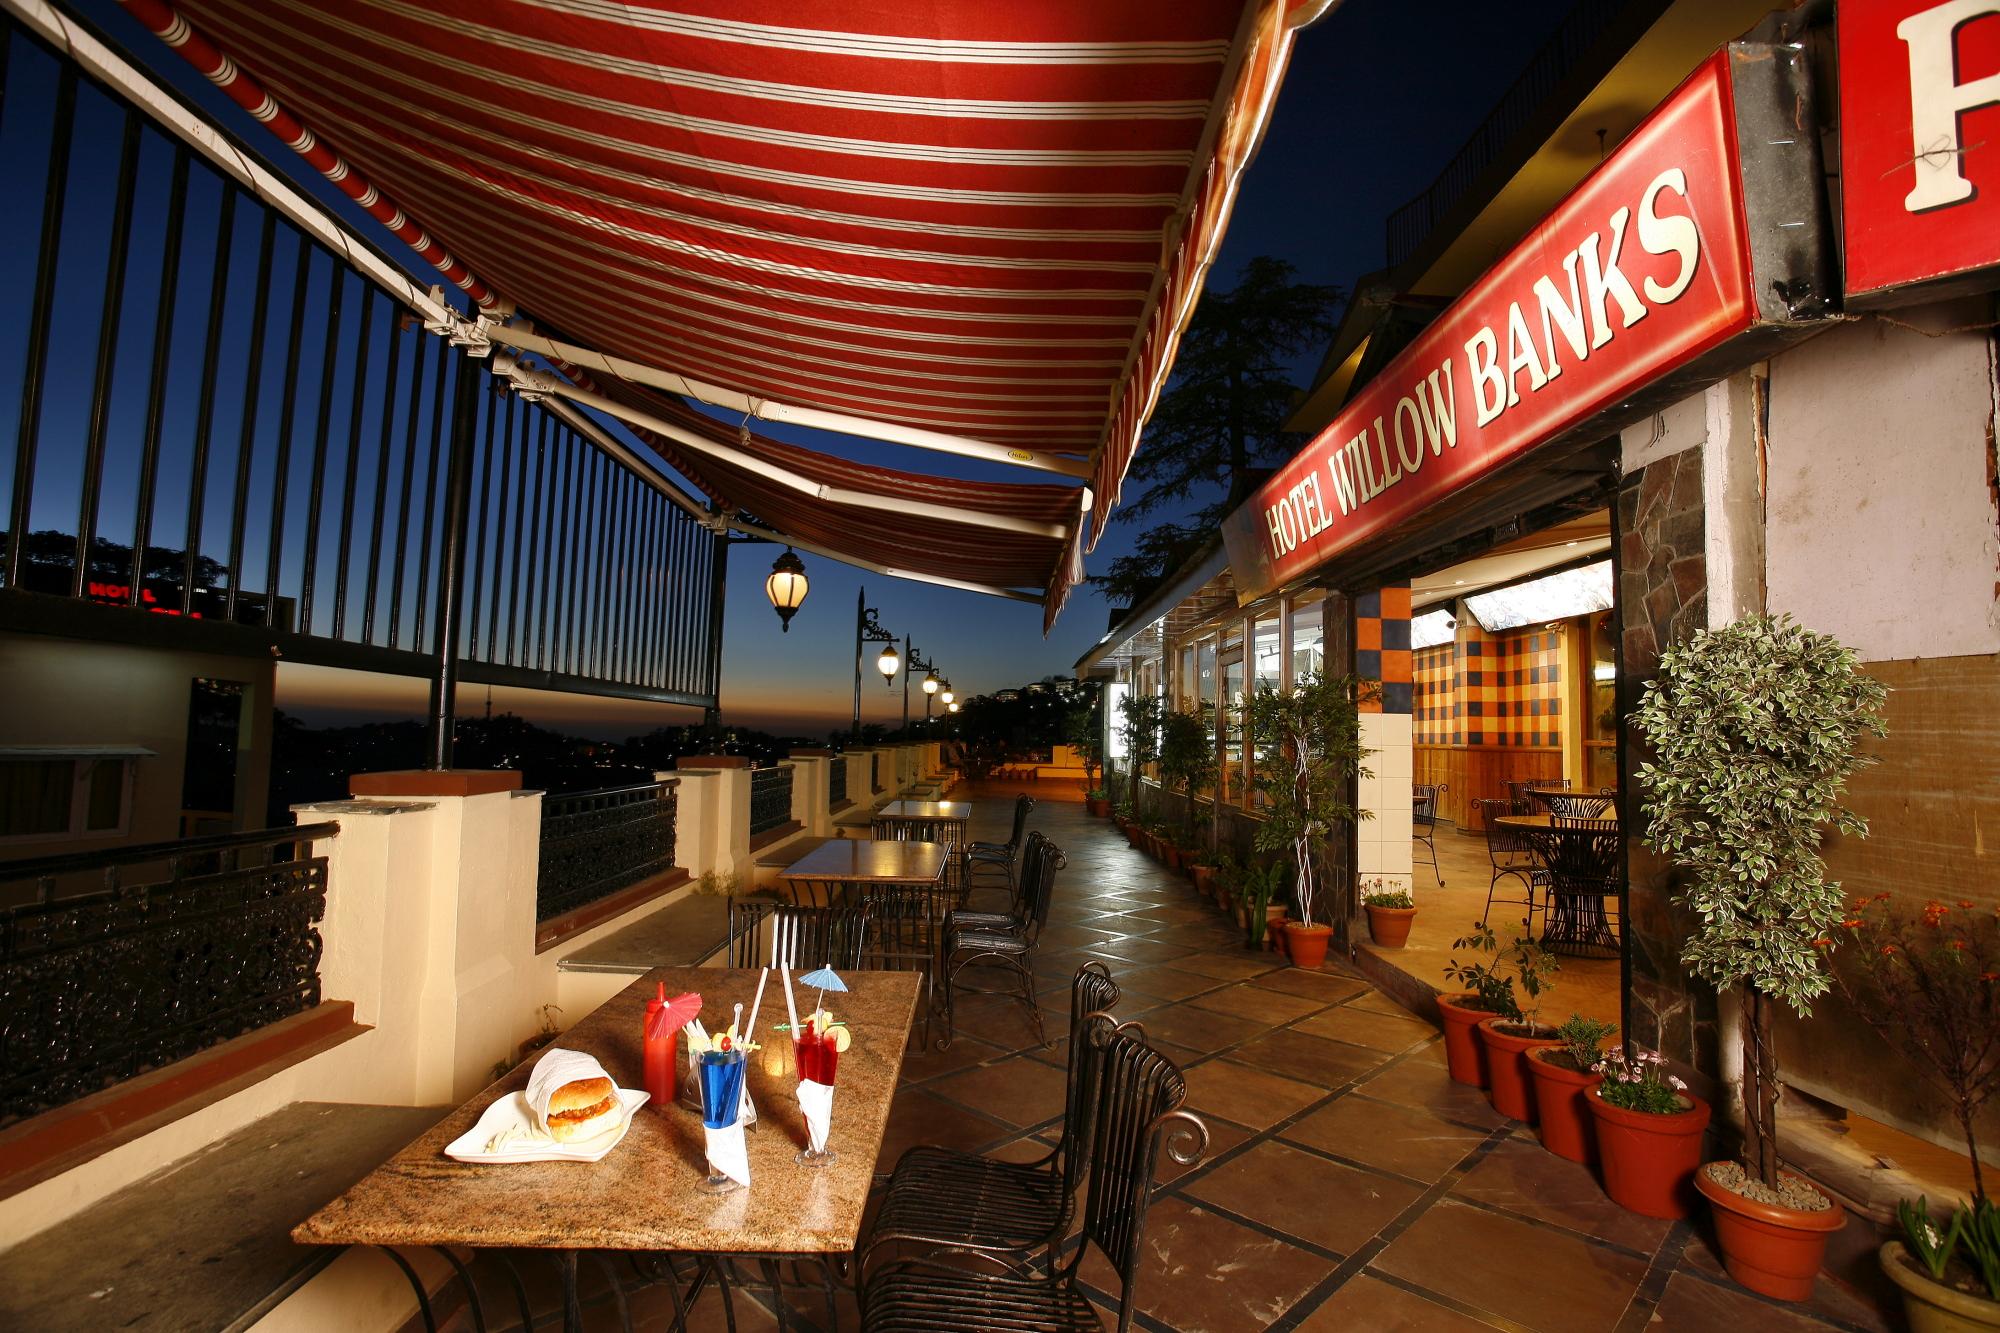 hotel willow banks shimla_10202net wix